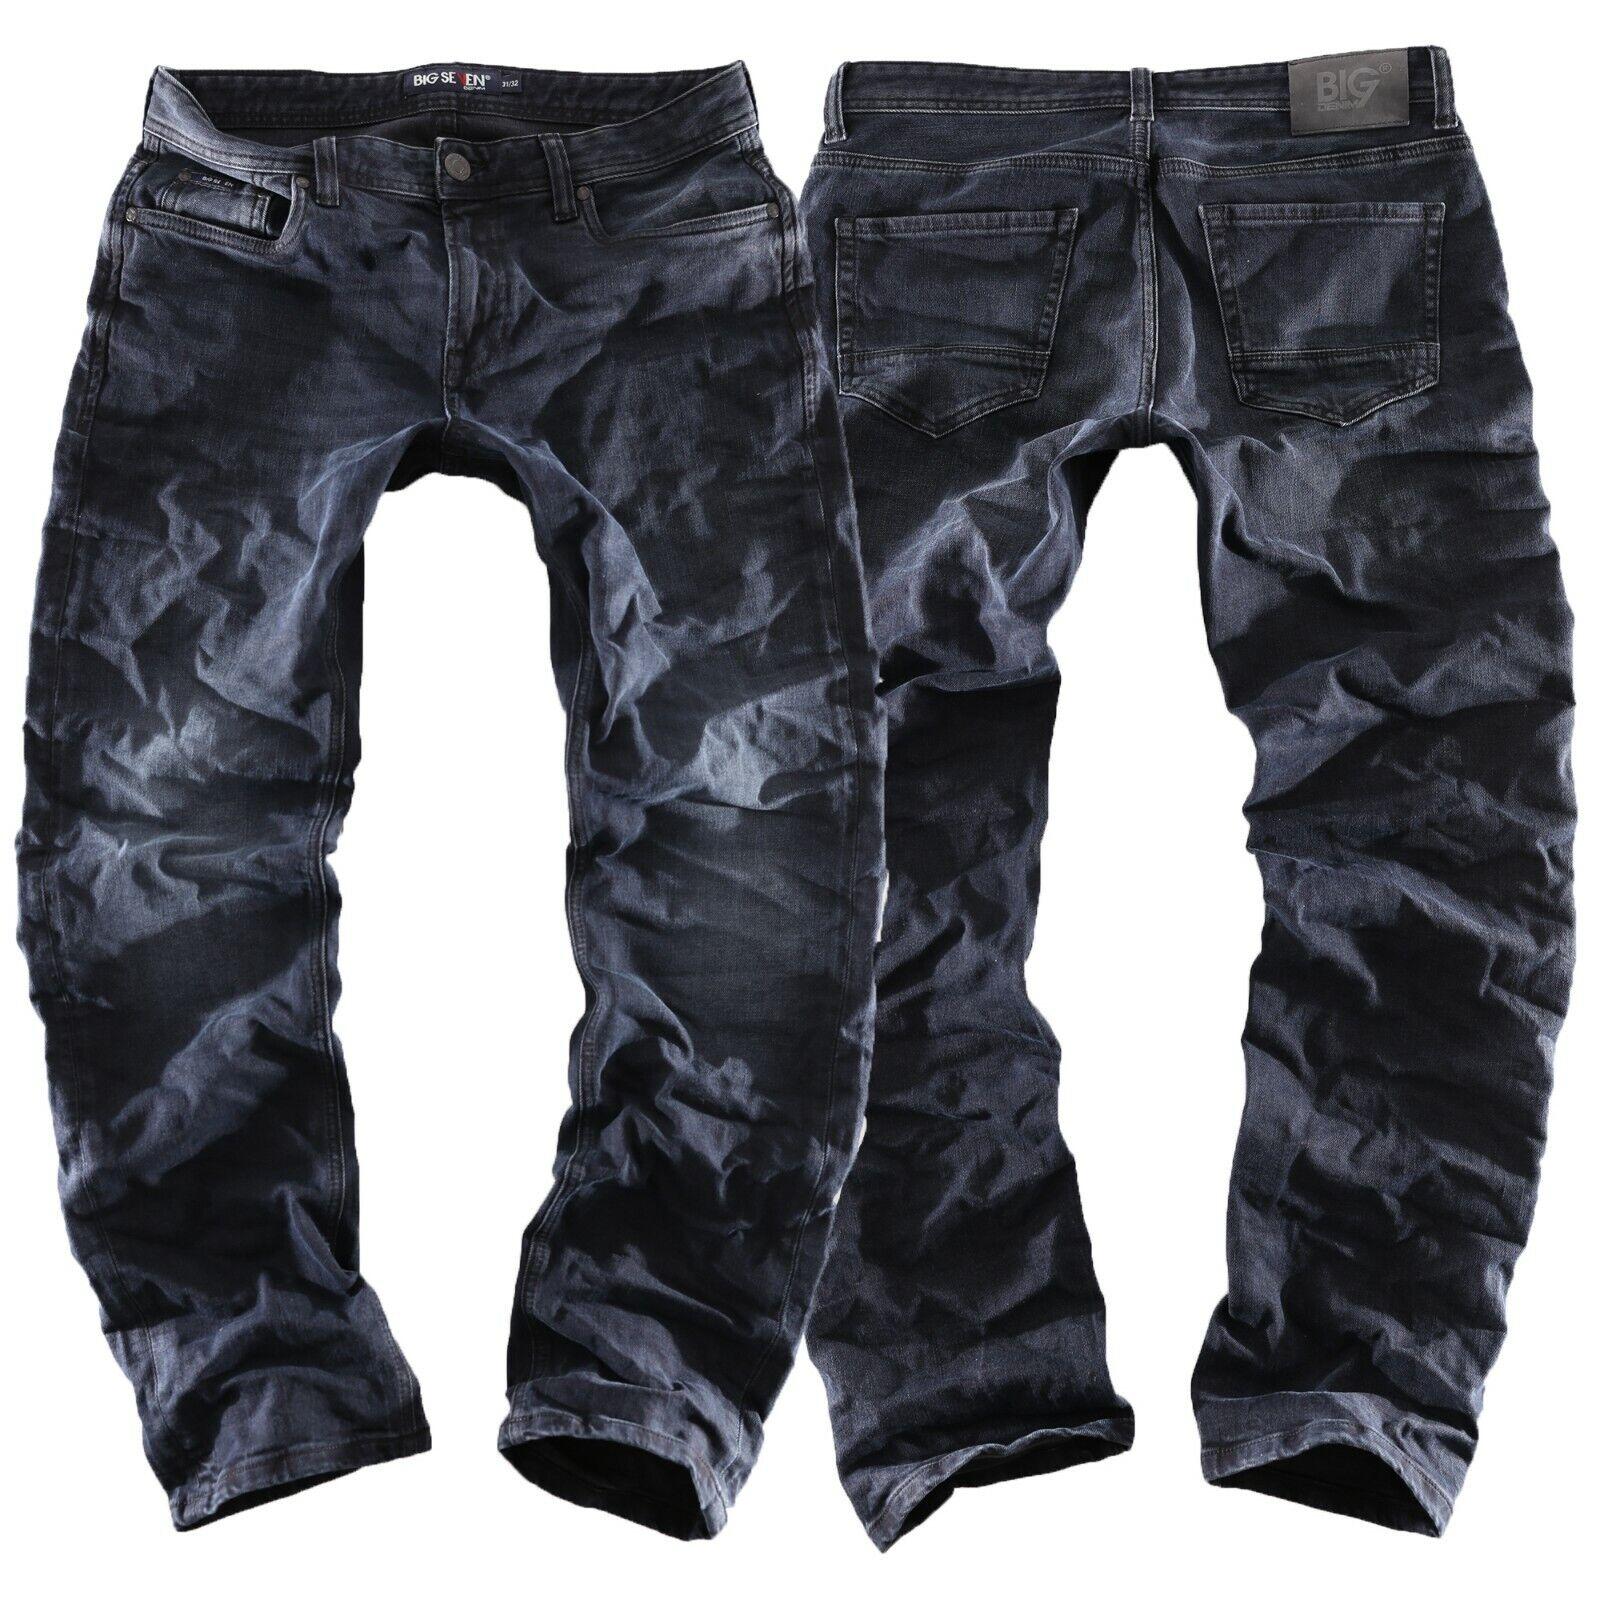 Big Seven Cade Luxe Lavado blue - Regular Recto Pantalones Vaqueros de Hombre